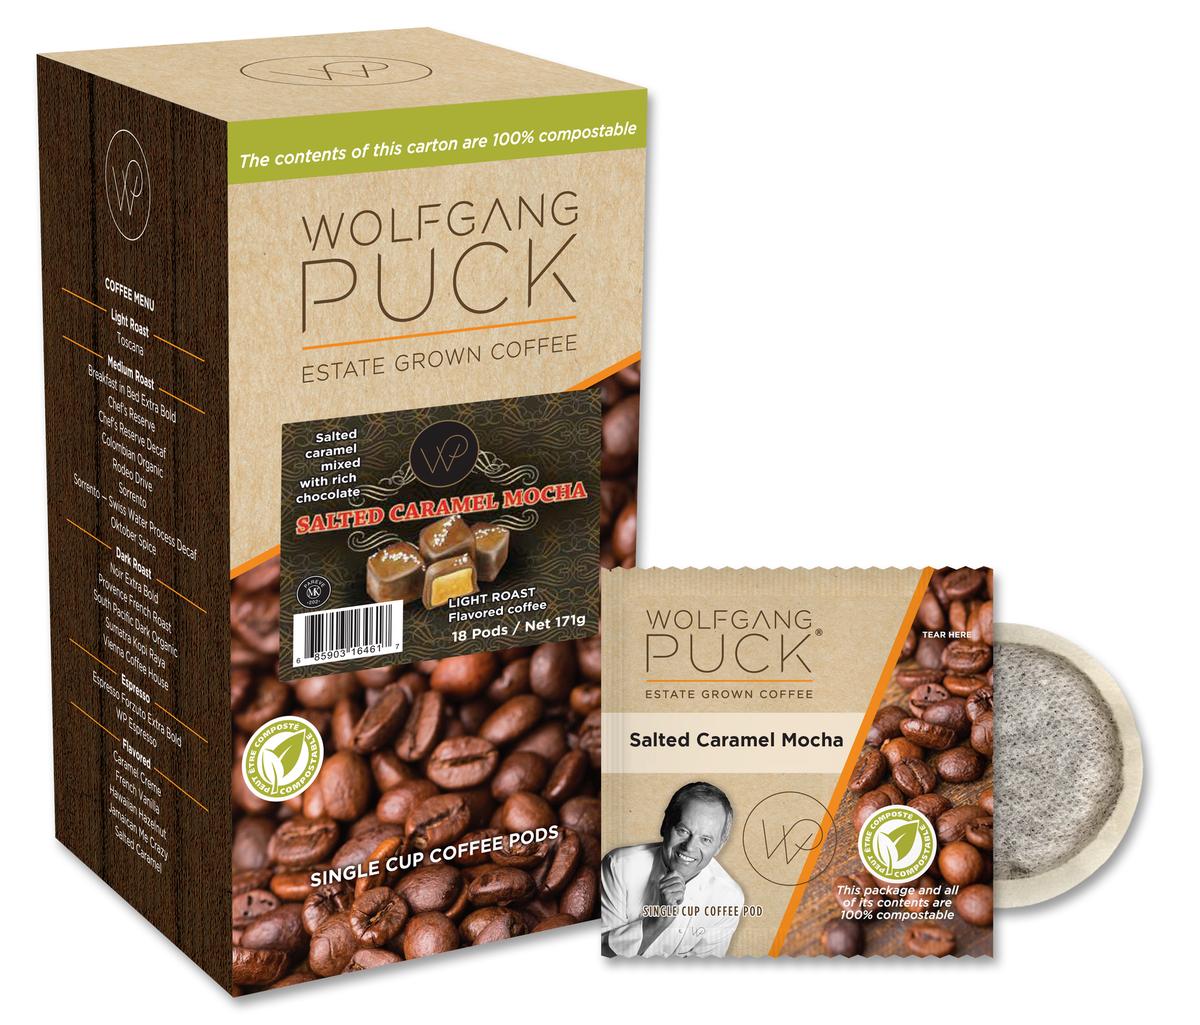 Wolfgang Puck Salted Caramel Mocha POD